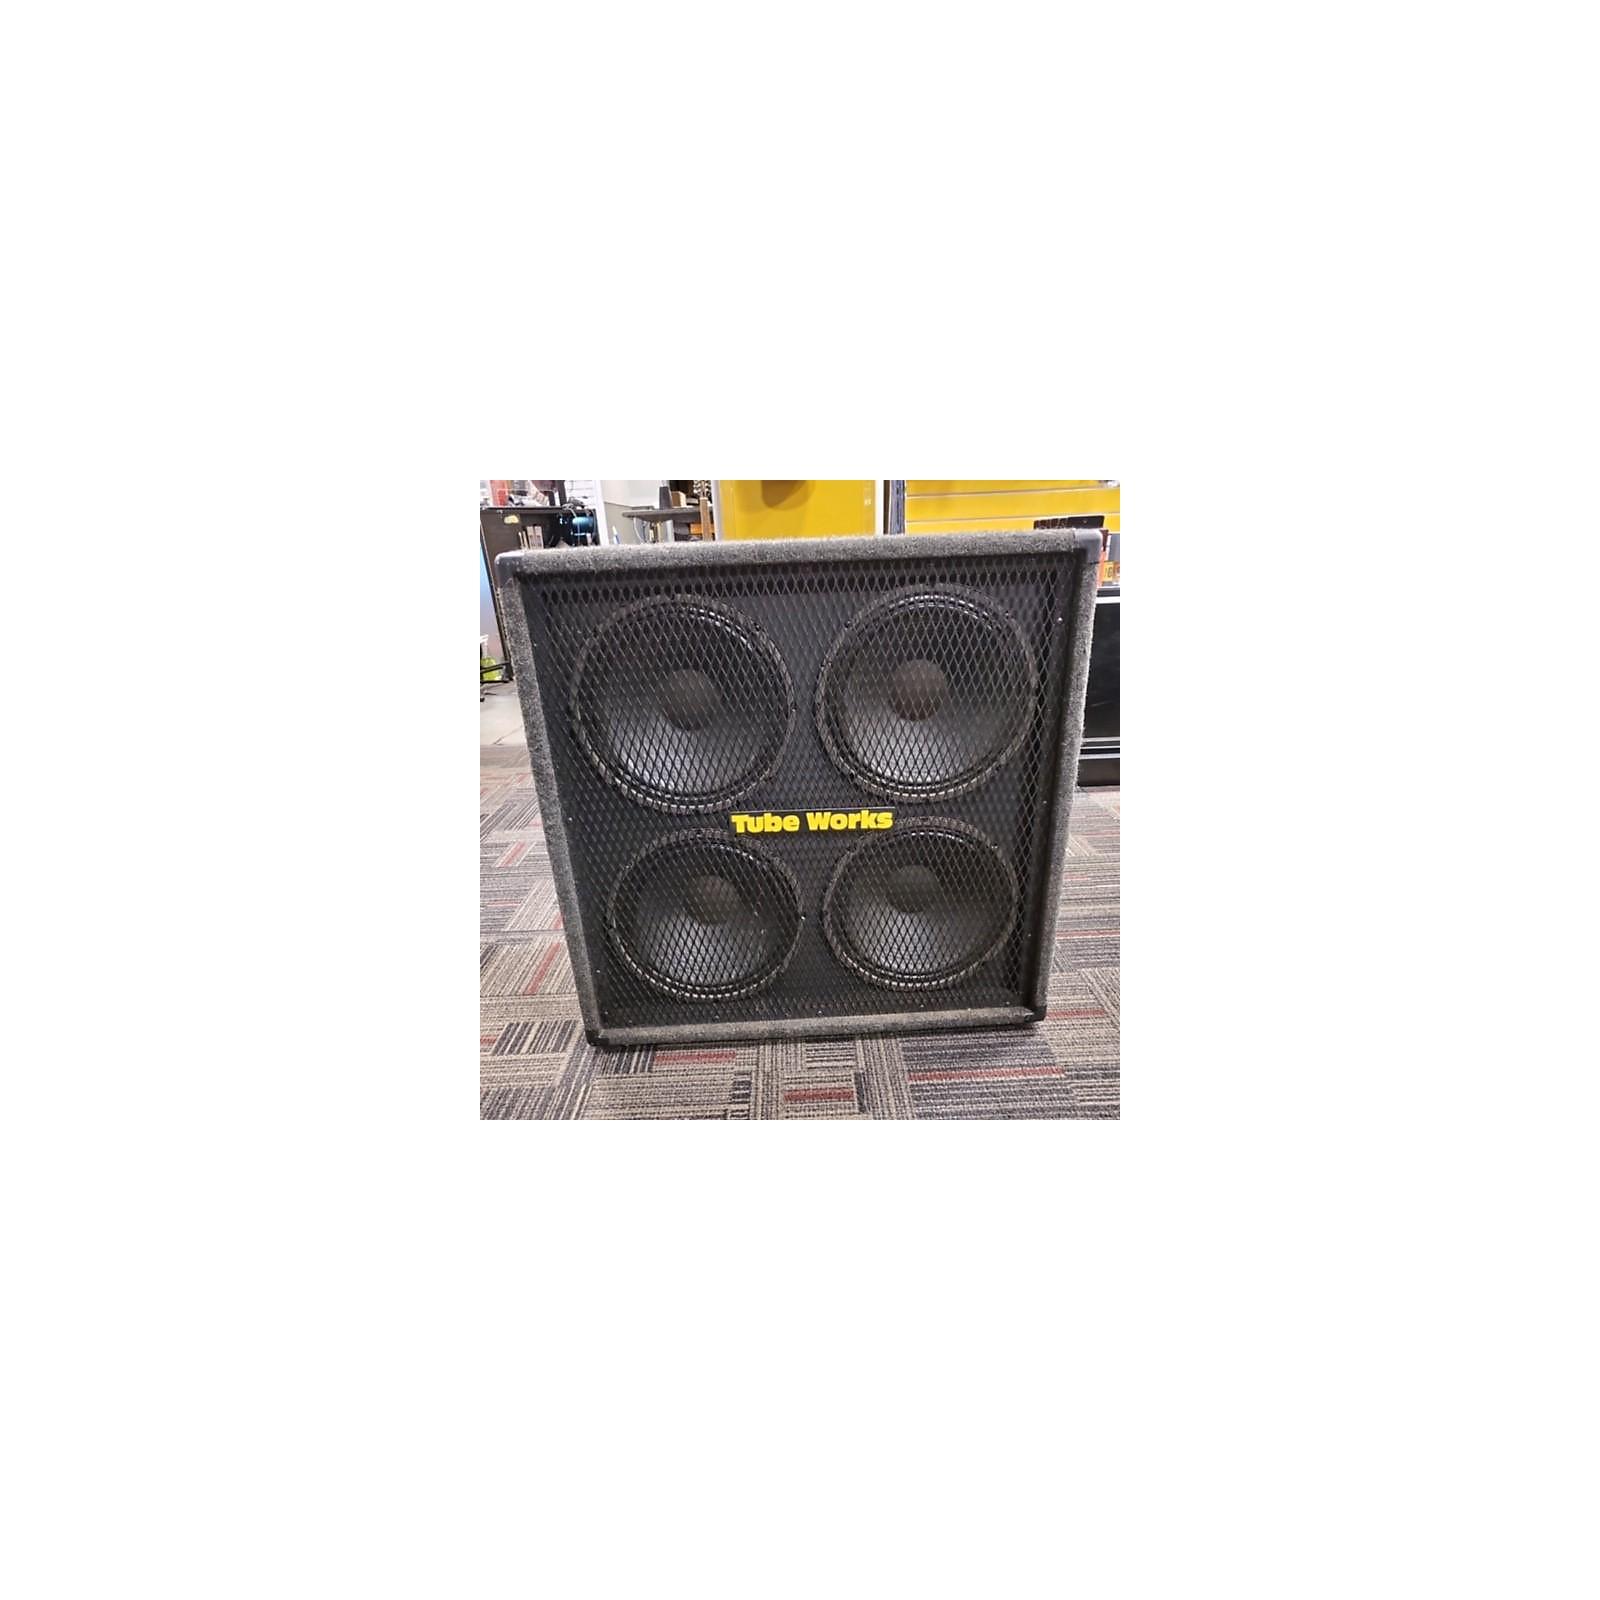 Tubeworks 4x12 Flat Front Cab Guitar Cabinet